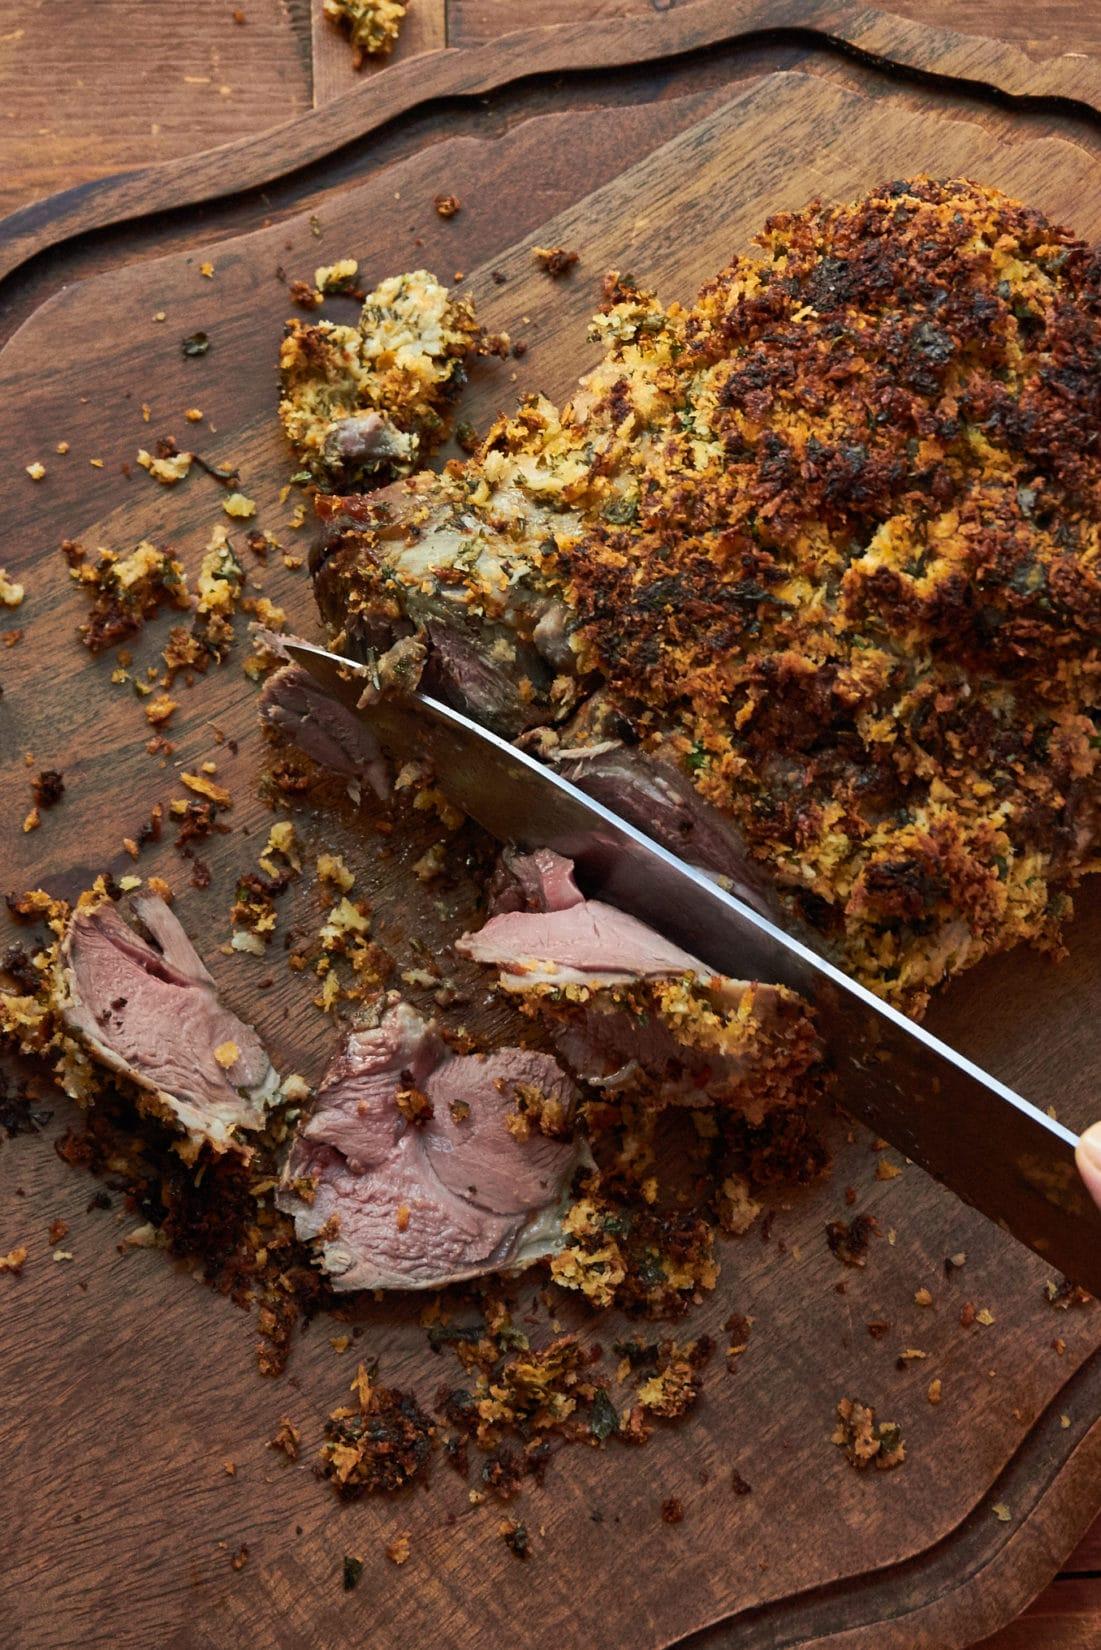 Herbed Boneless Leg of Lamb with Mustard Crust / Mia / Katie Workman / themom100.com